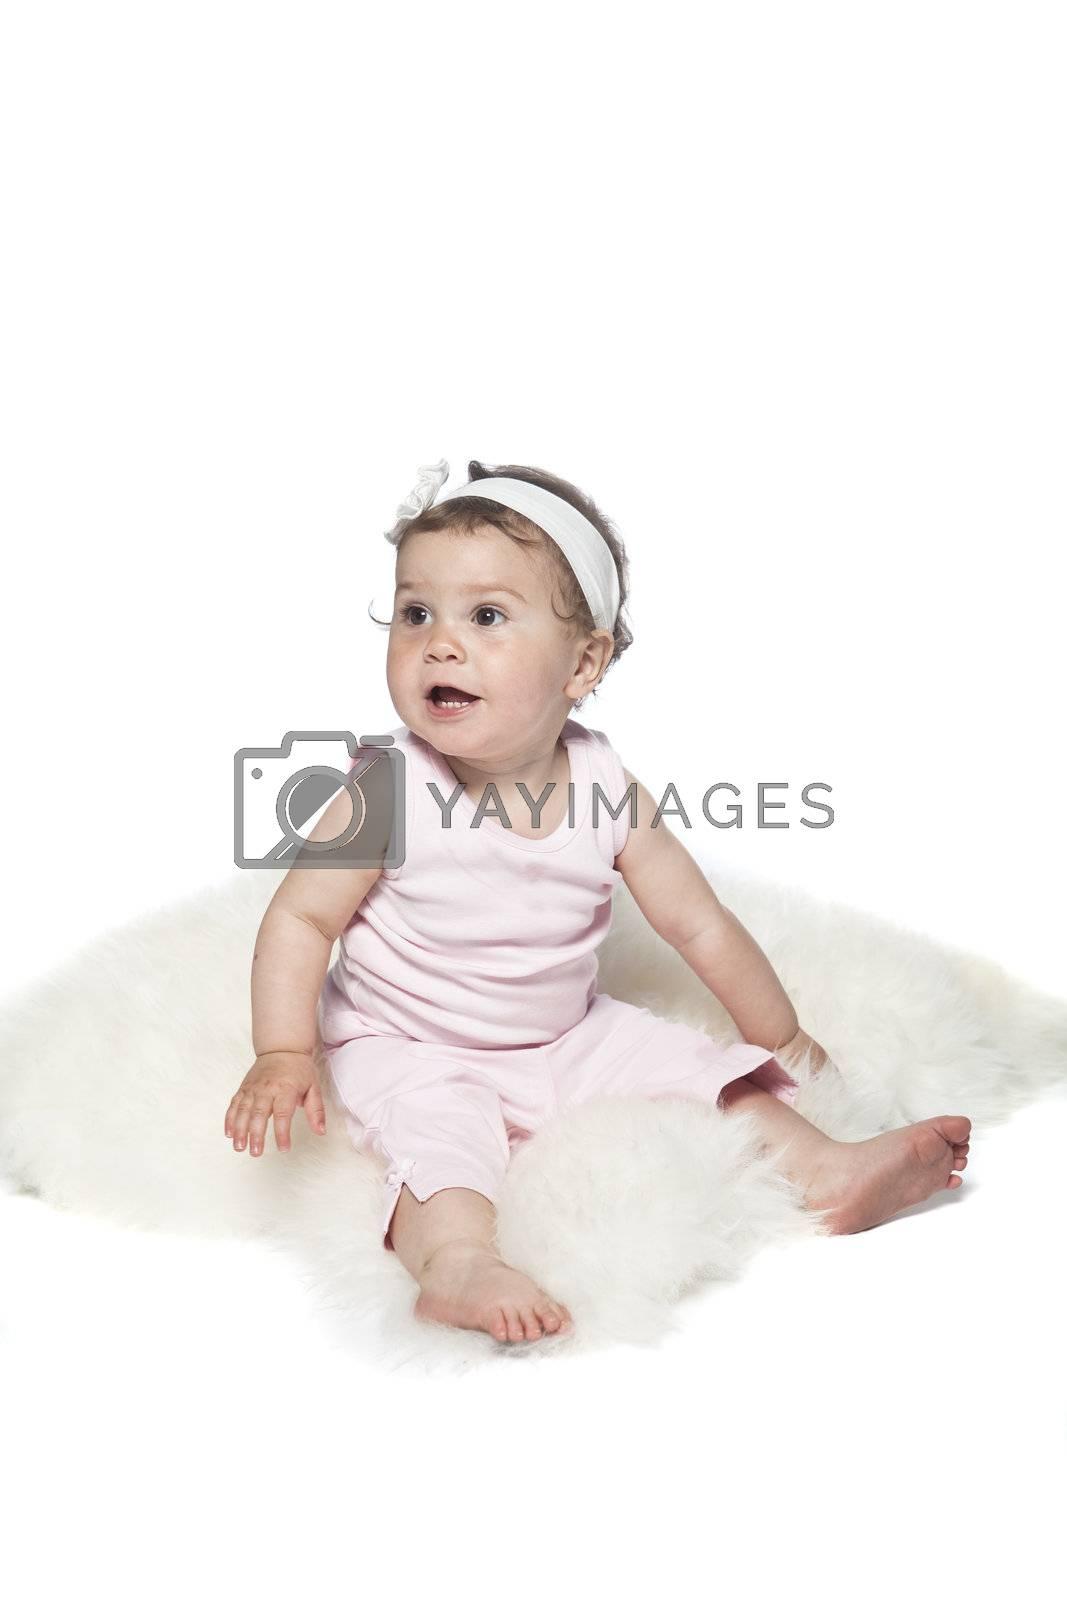 Baby sitting on a sheepskin isolated on white